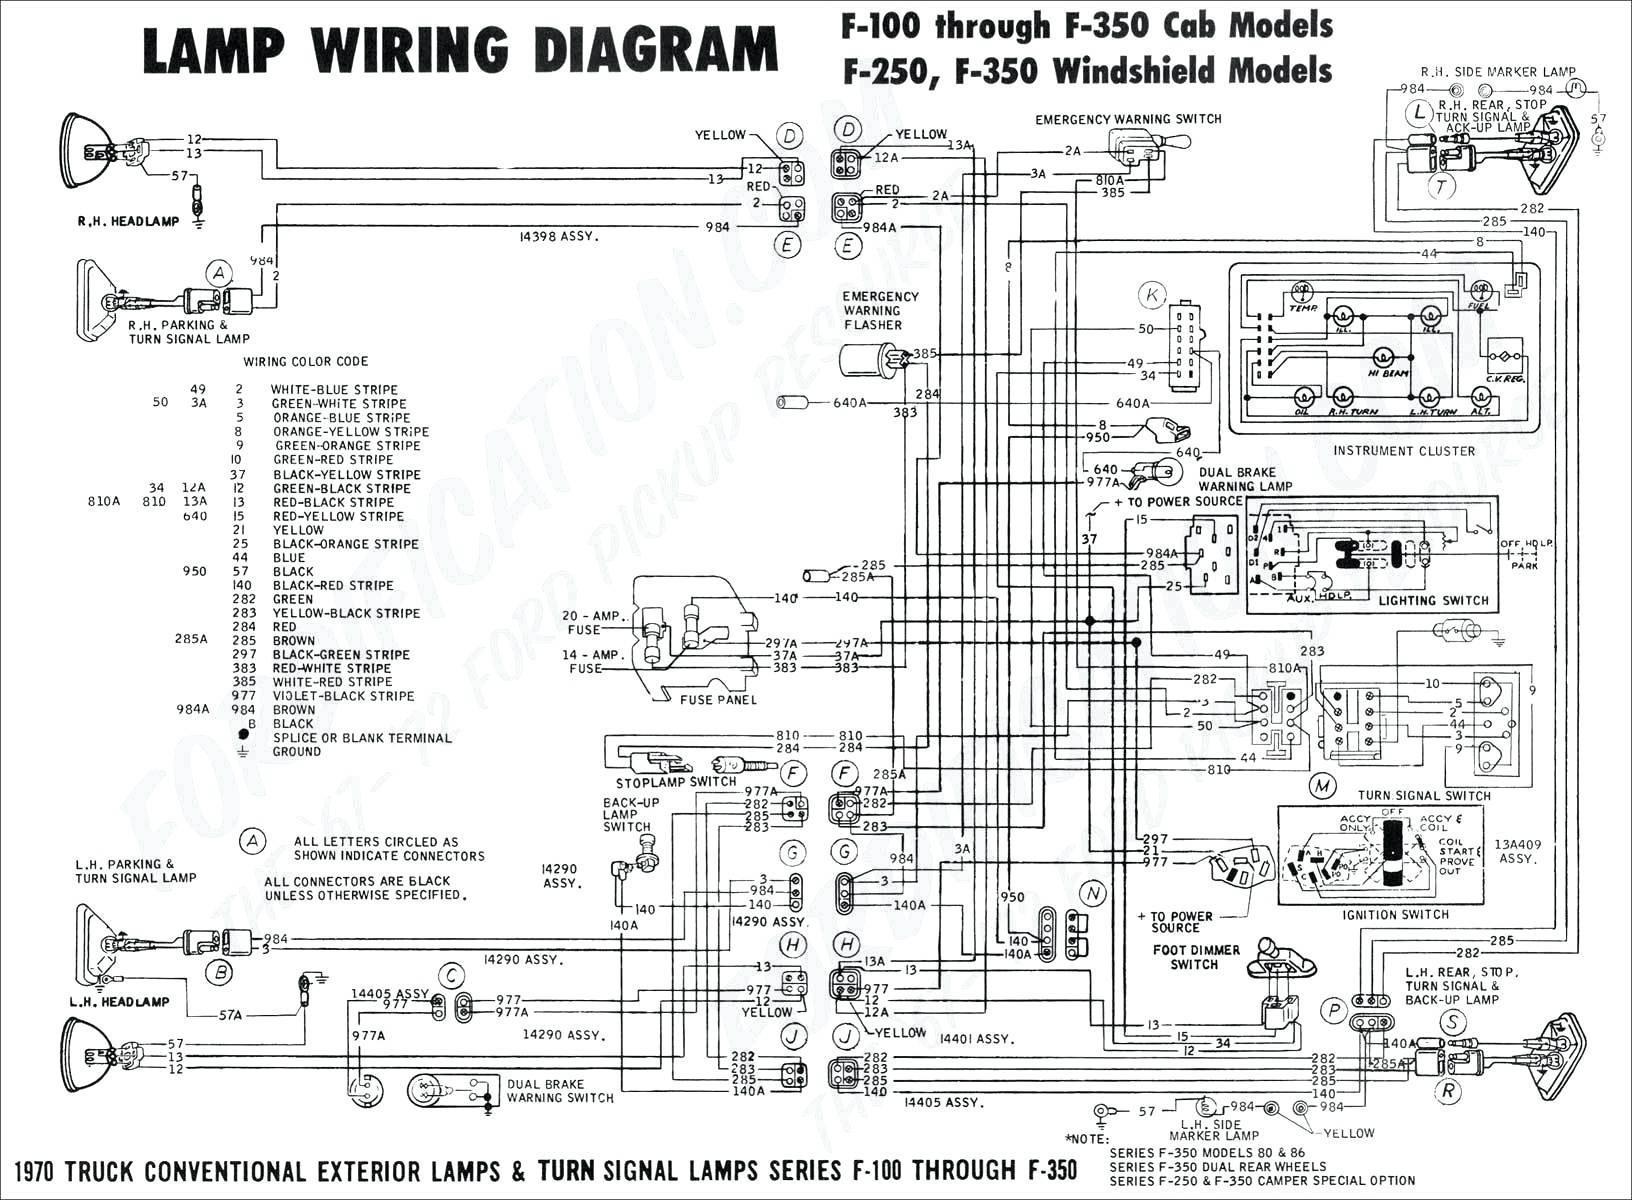 Mazda Mx6 Engine Diagram 07 Escalade Wiring Diagram Another Blog About Wiring Diagram • Of Mazda Mx6 Engine Diagram